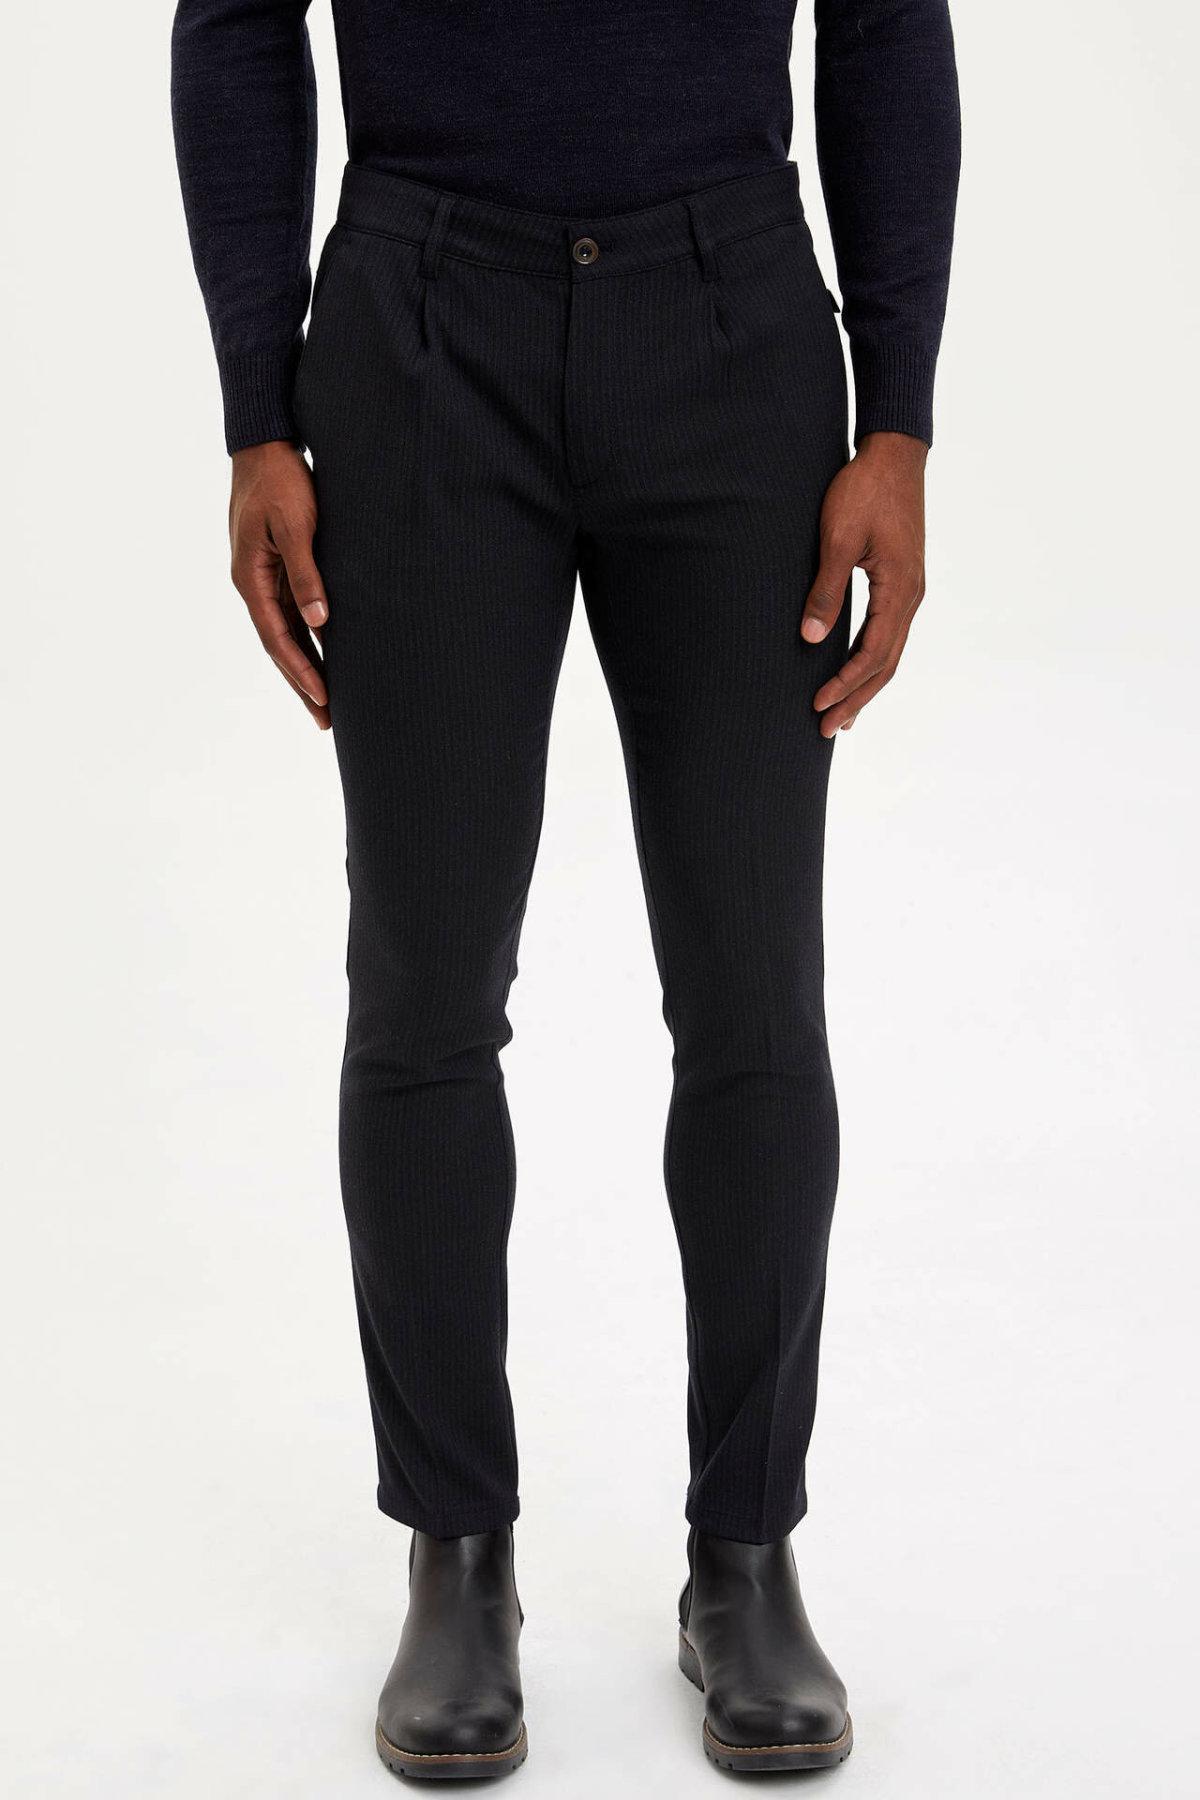 DeFacto Man Winter Smart Casual Long Pants Men Black Bottoms Male Slim Fit Body Pants Men Mid-waist Trousers-M2176AZ19WN